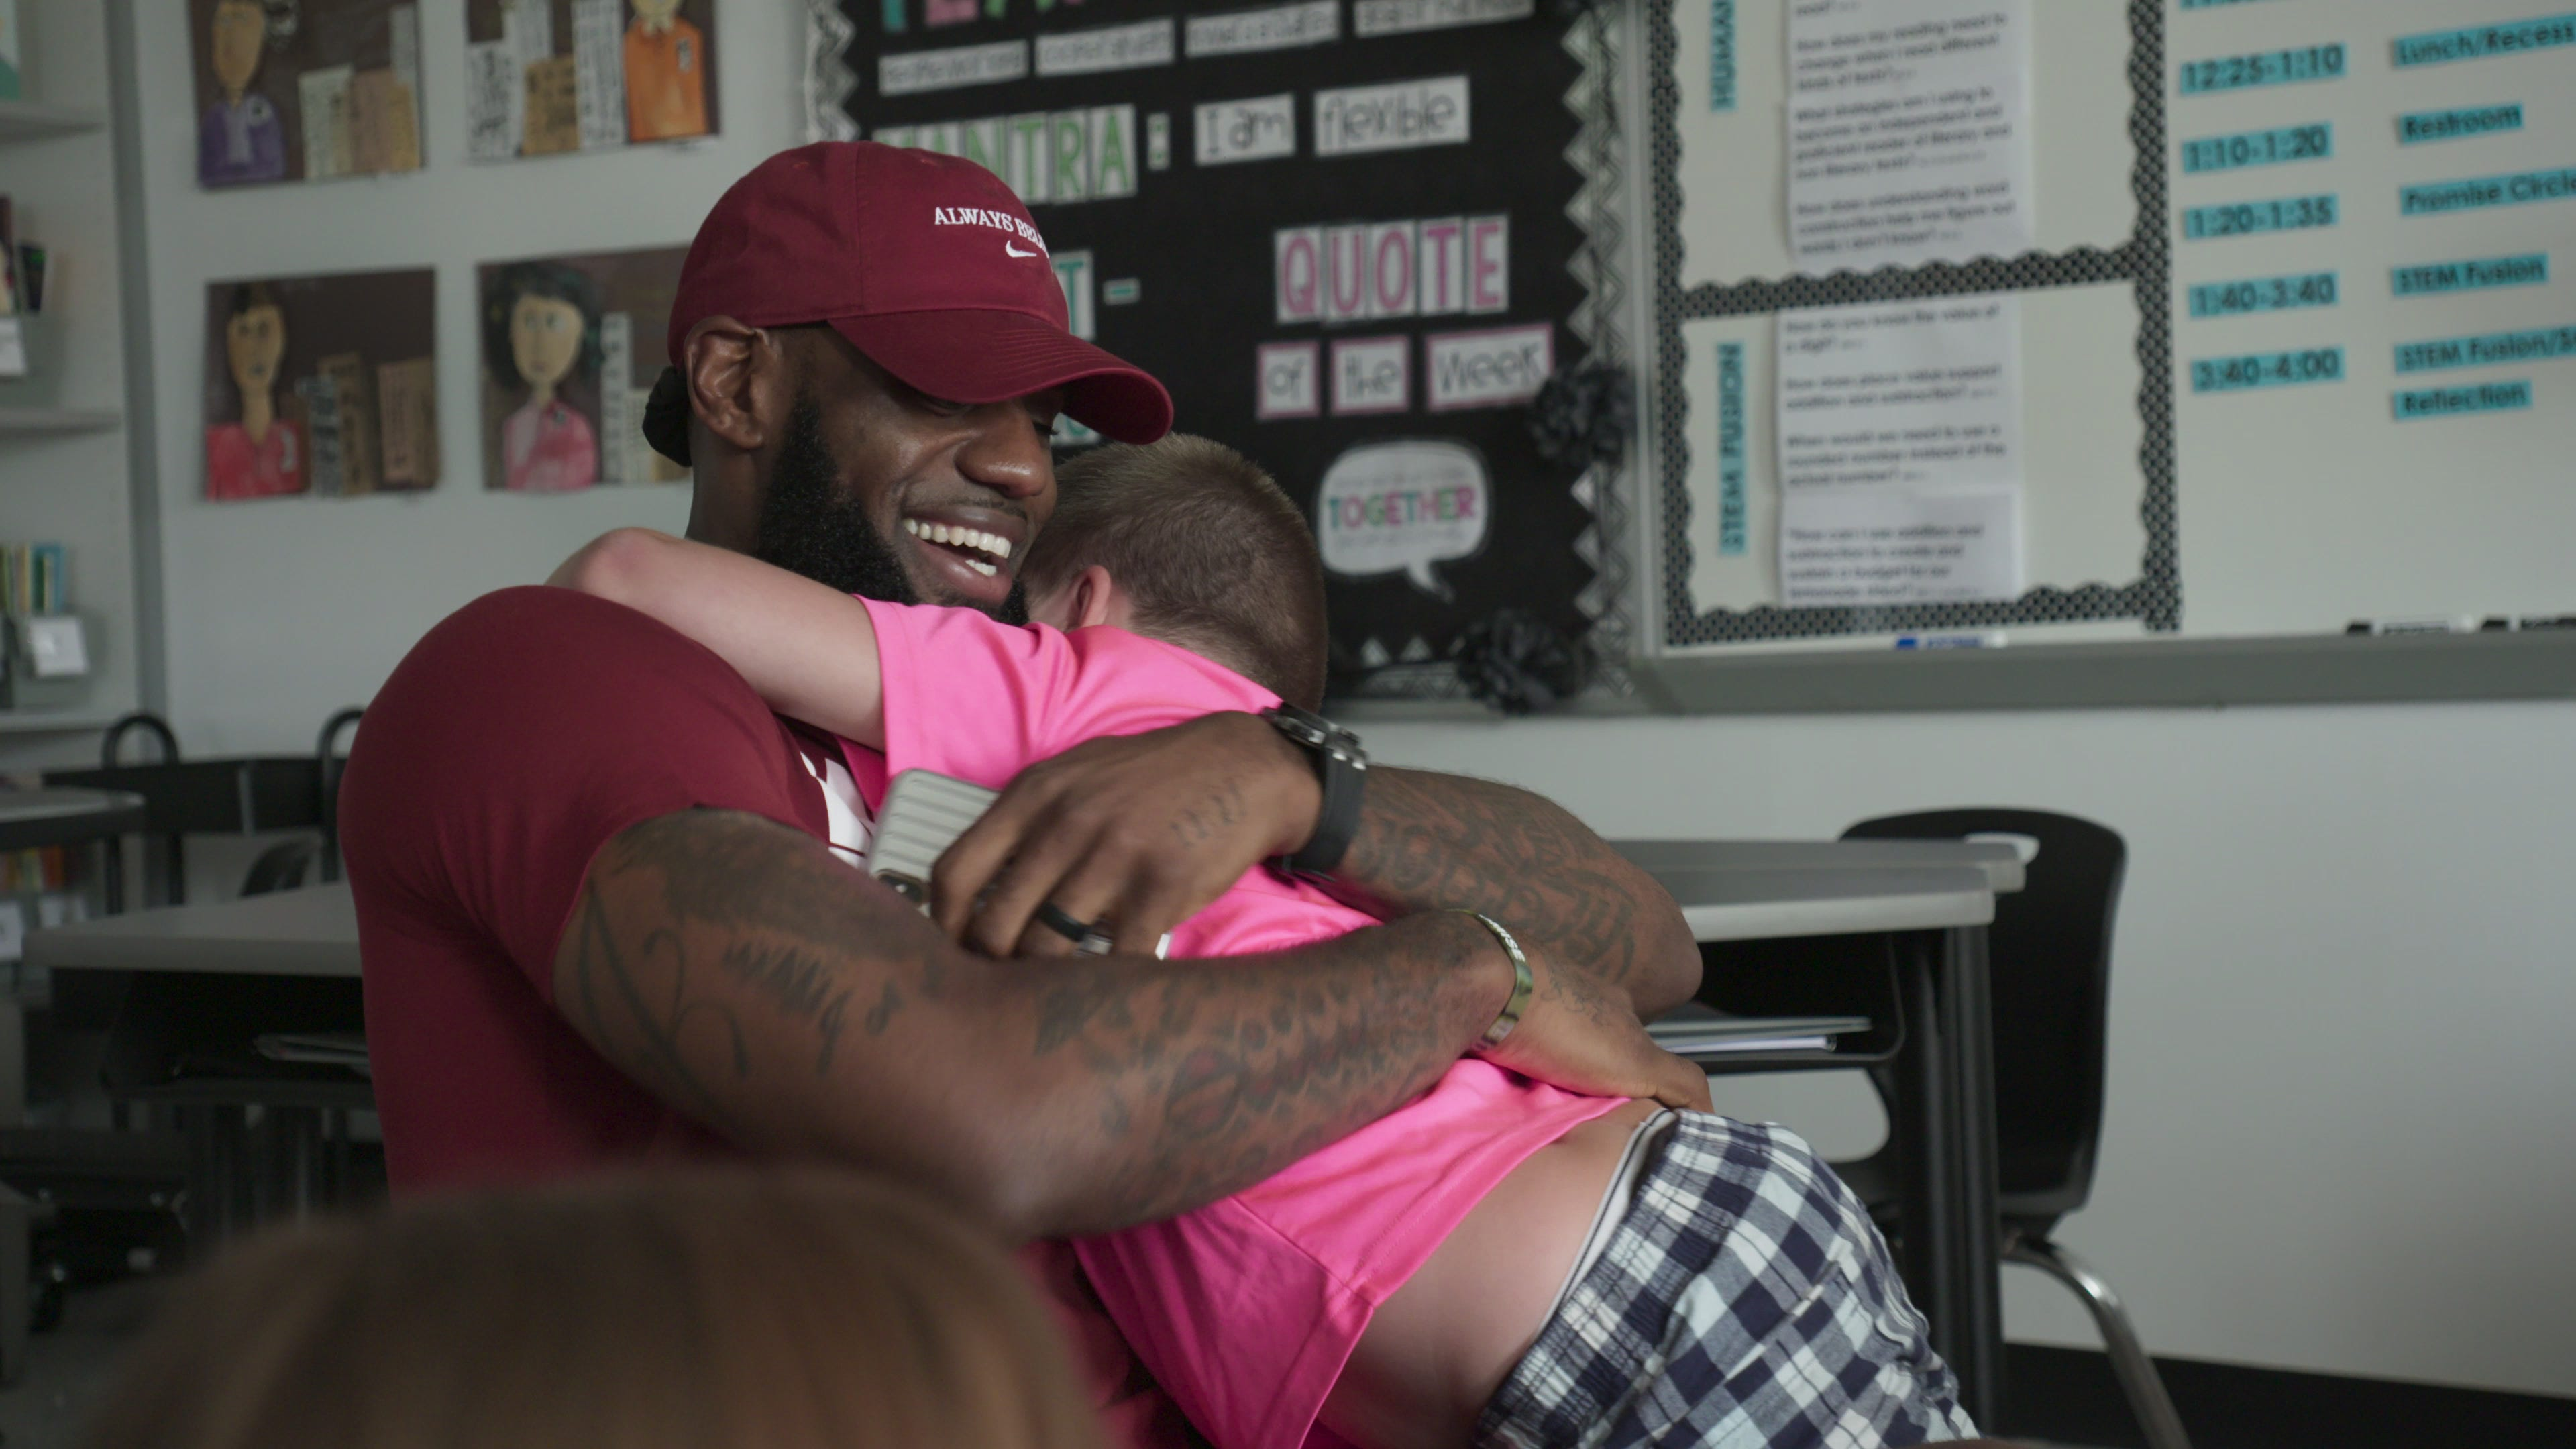 LeBron James produced 'I Promise' documentary debuts Monday on Quibi